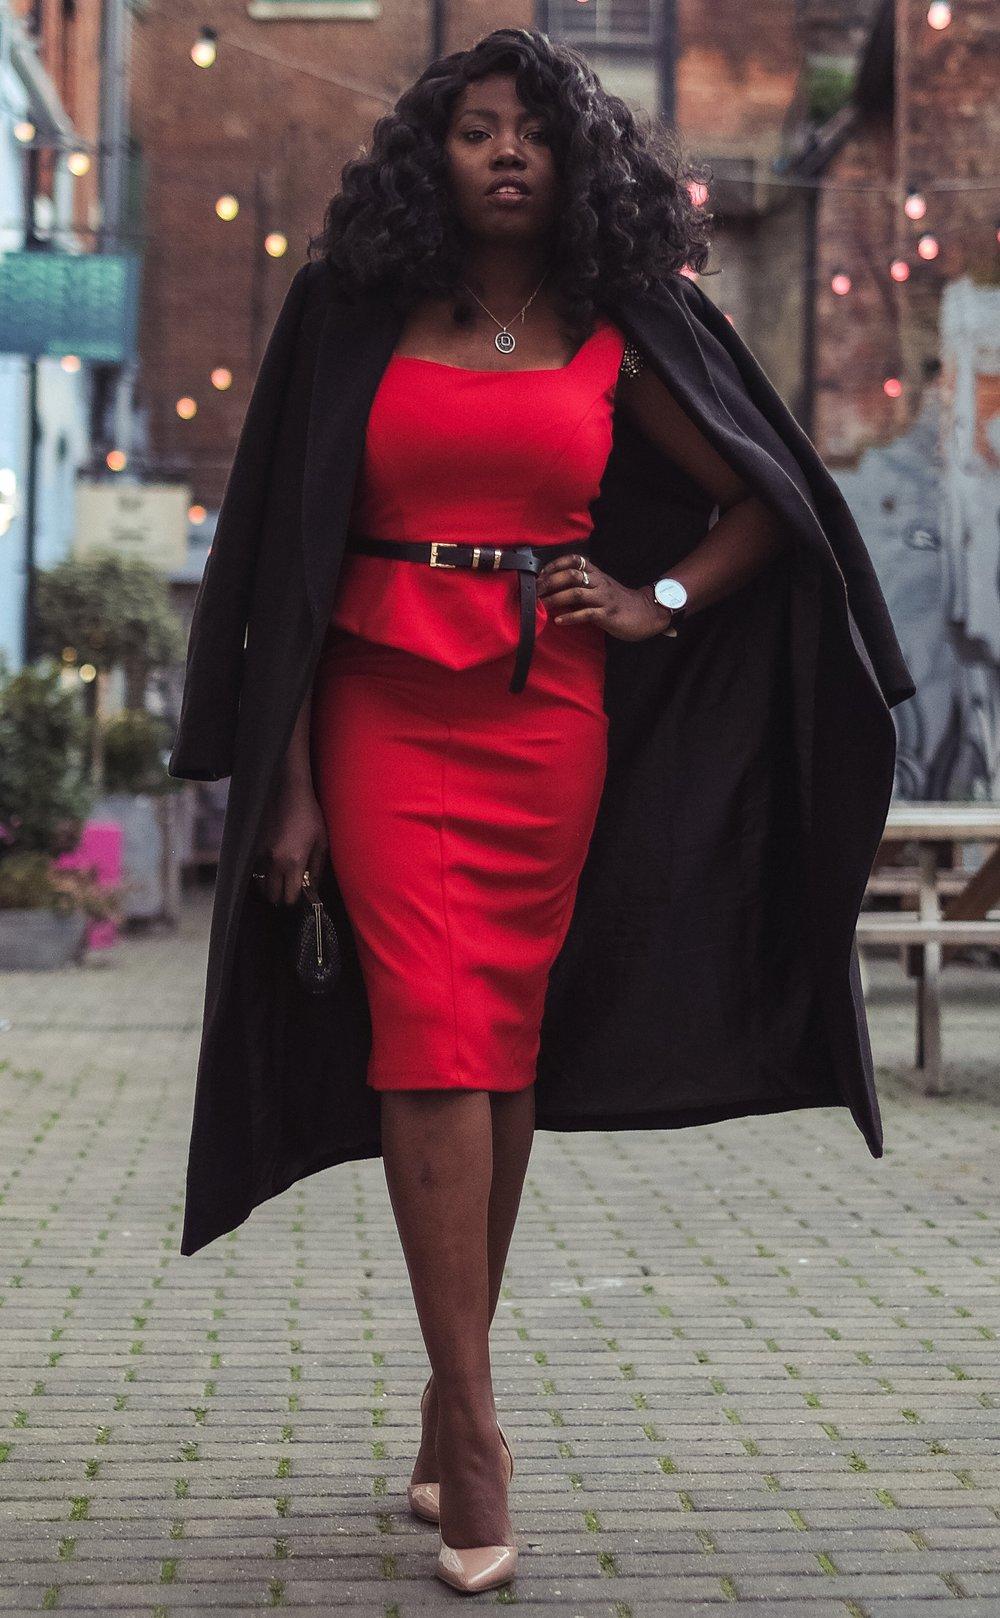 The+Red+Dress+%7C+Style+Medium